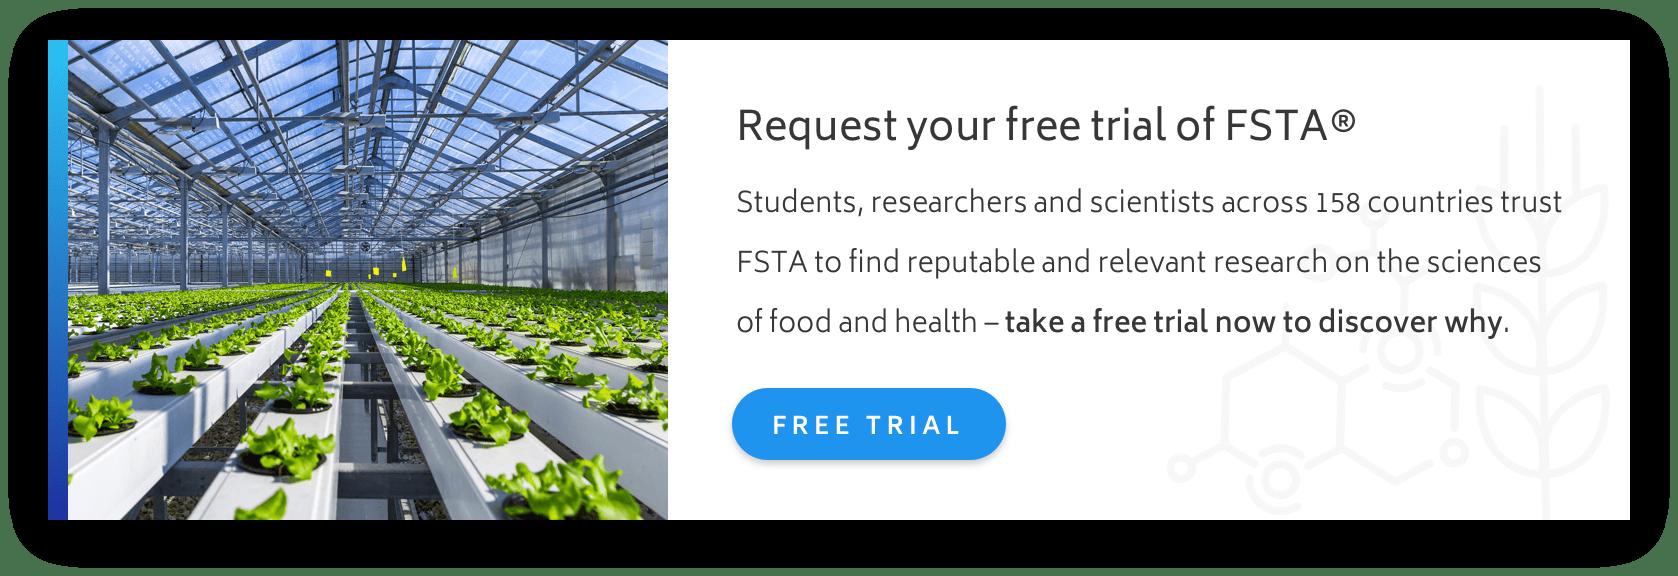 Free Trial of FSTA